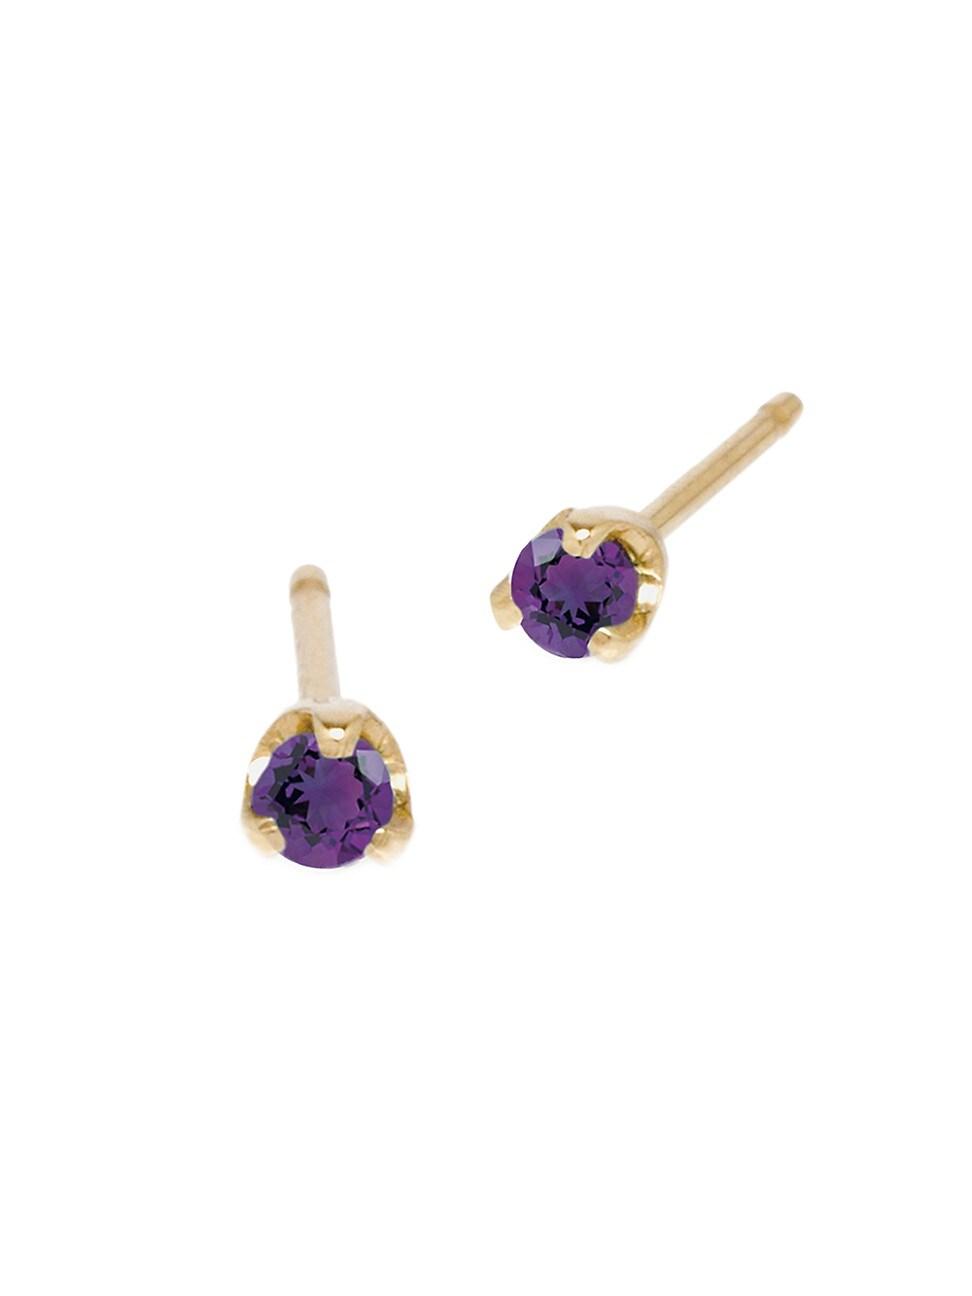 Zoë Chicco Women's Birthstones 14k Yellow Gold & Amethyst Prong Stud Earrings